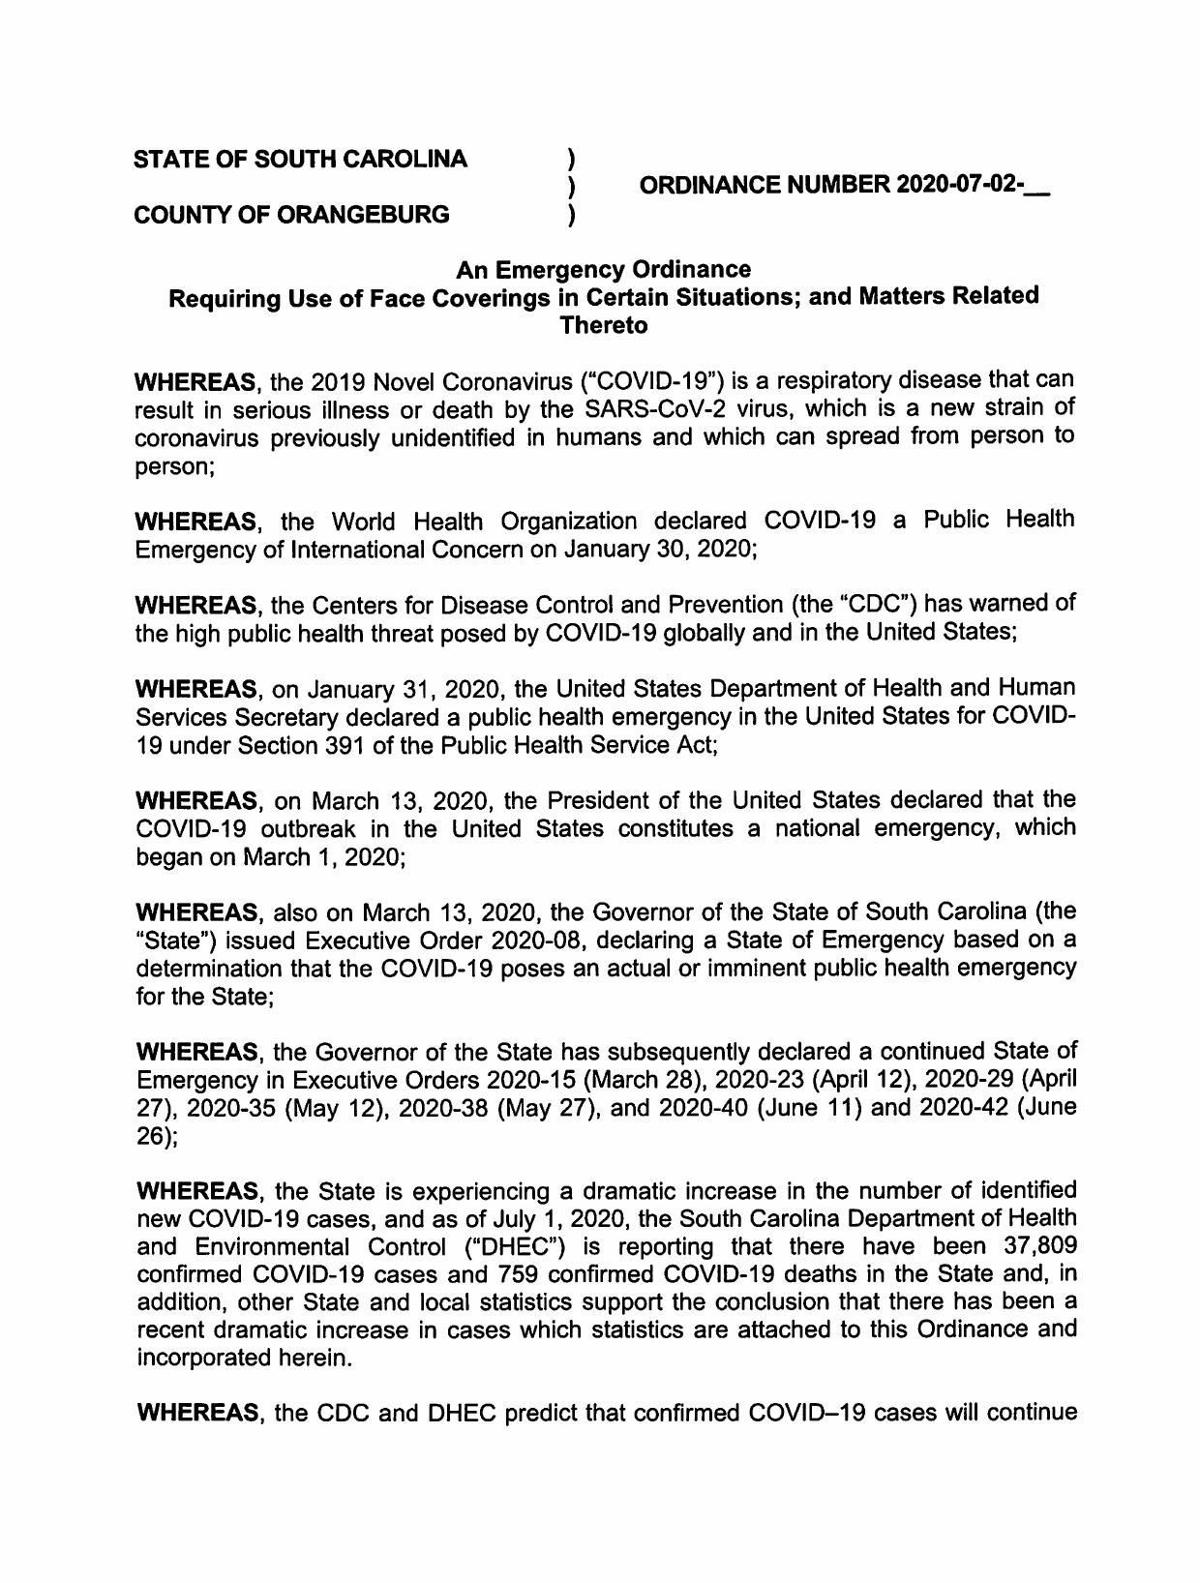 Emergency Ordinance Orangeburg County Face Coverings